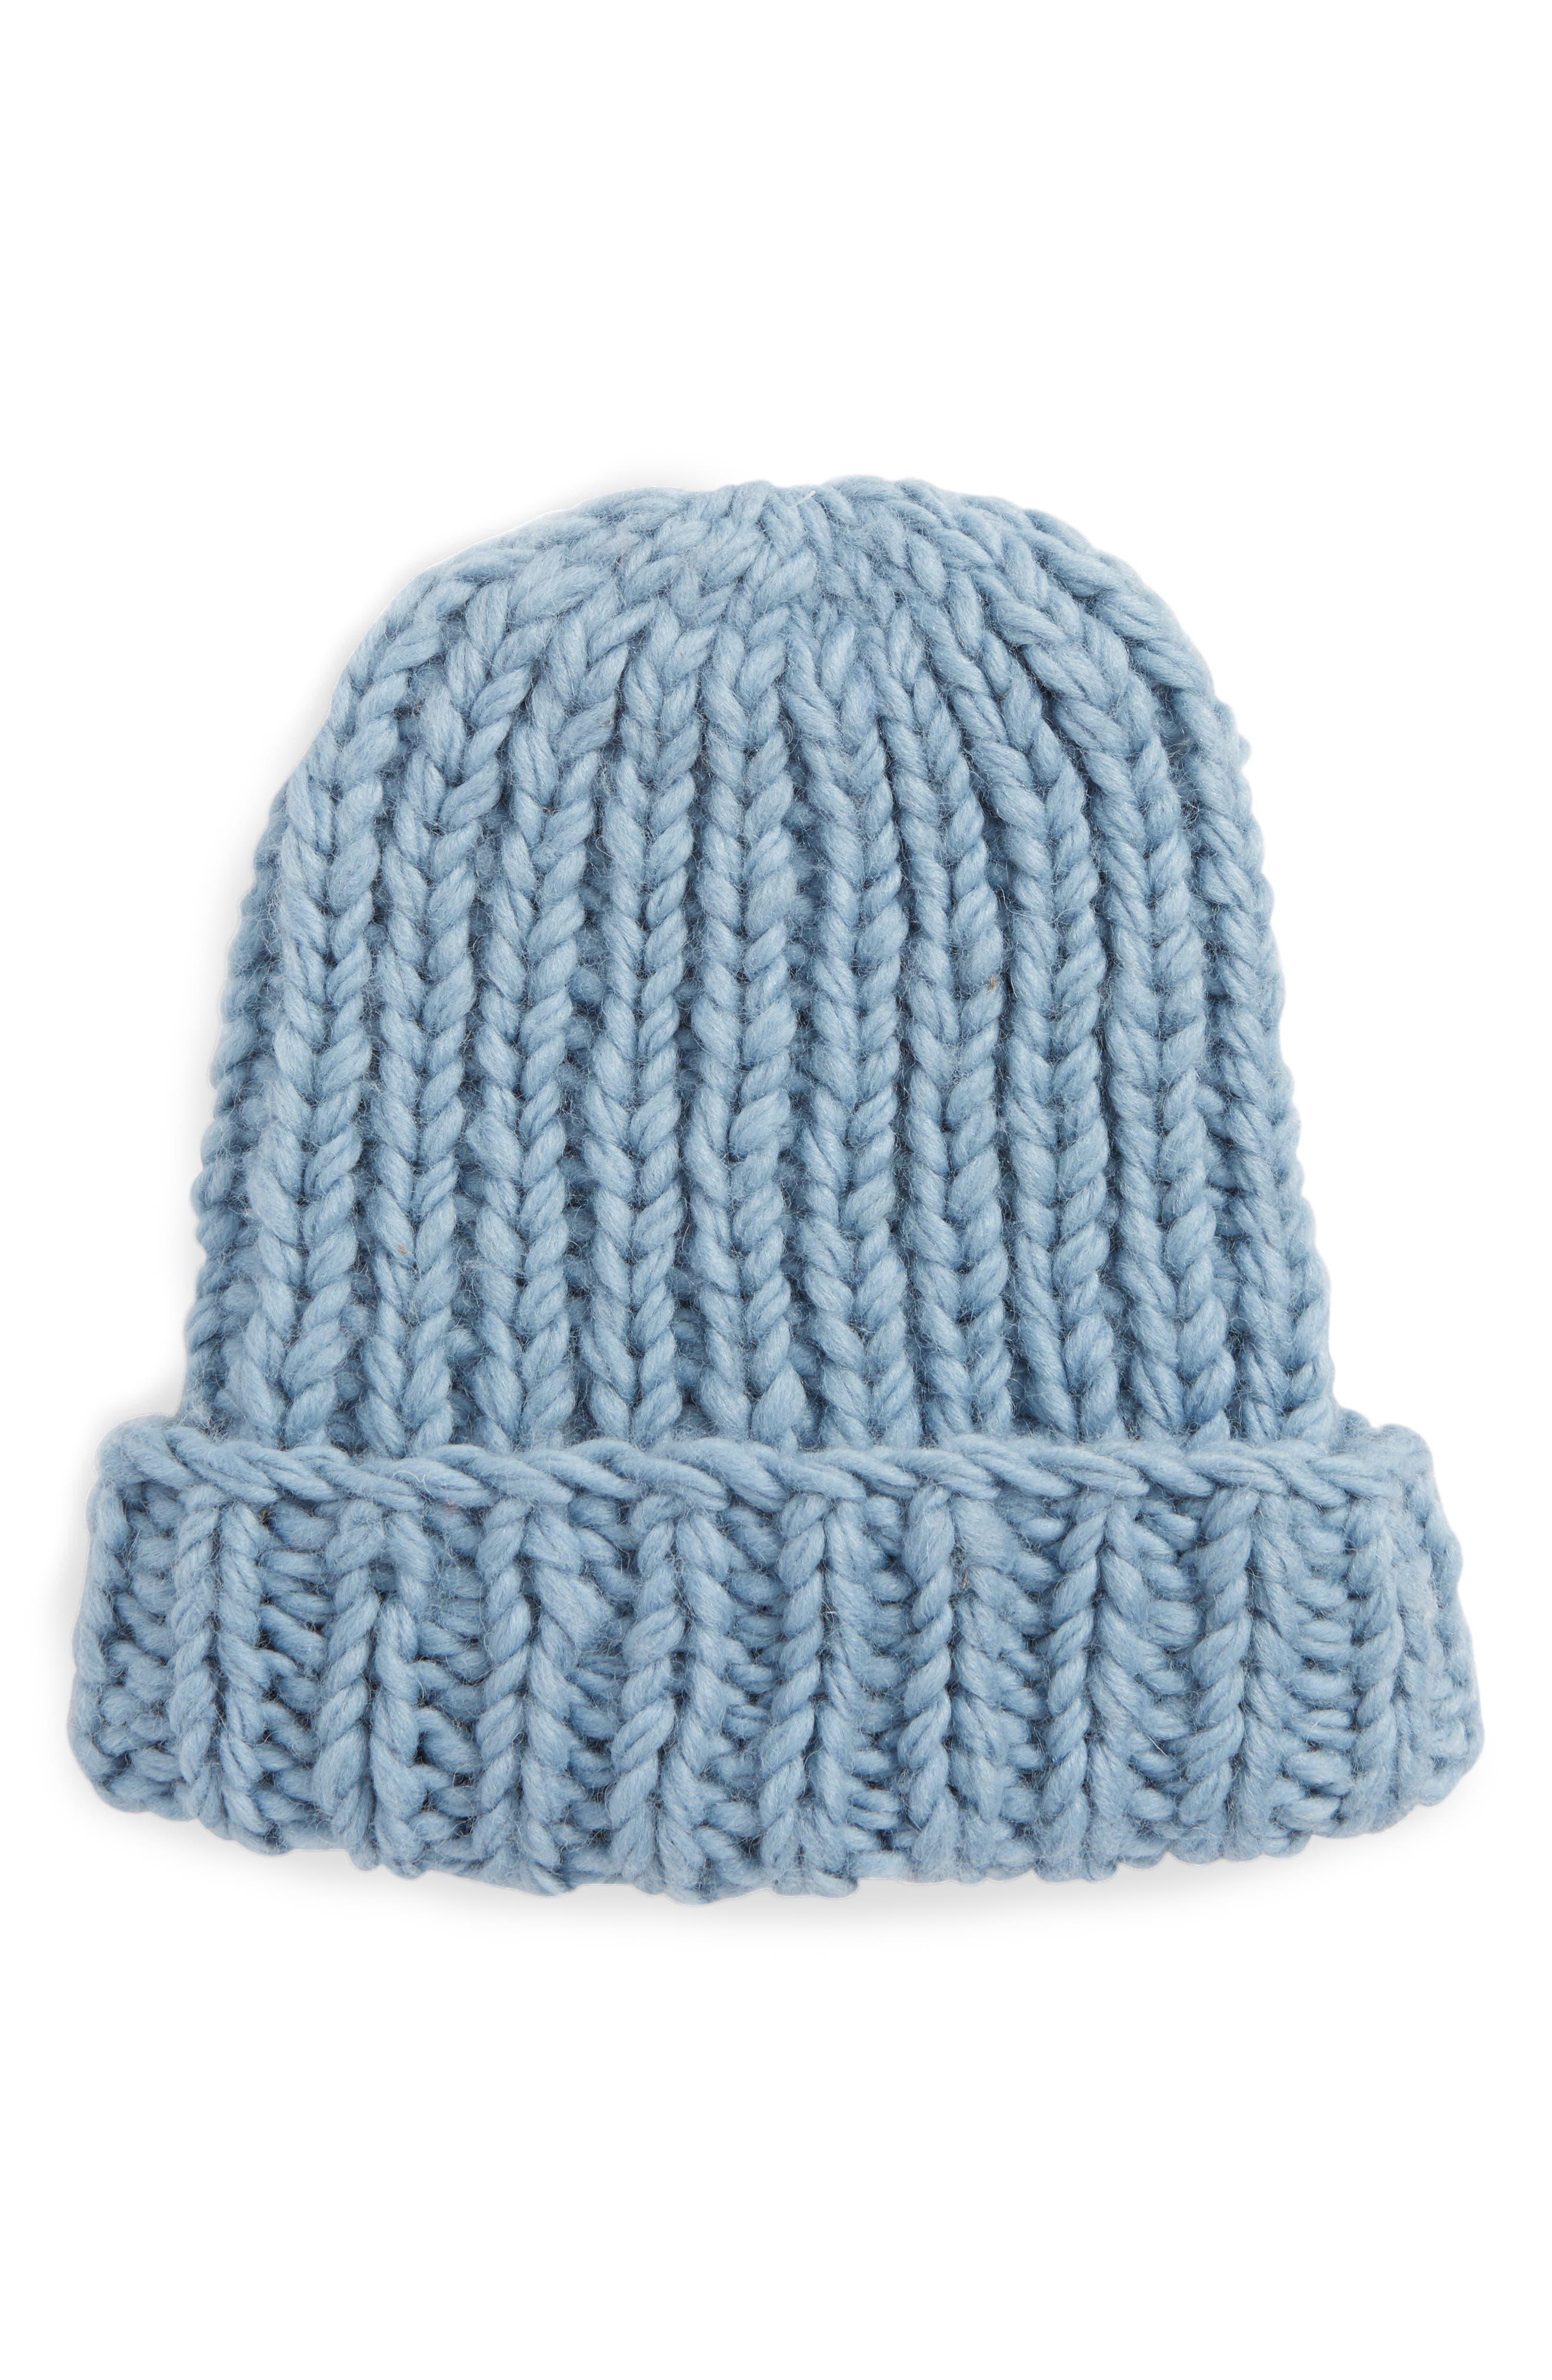 a3ed4620d59 Men s Beanies  Knit Caps   Winter Hats